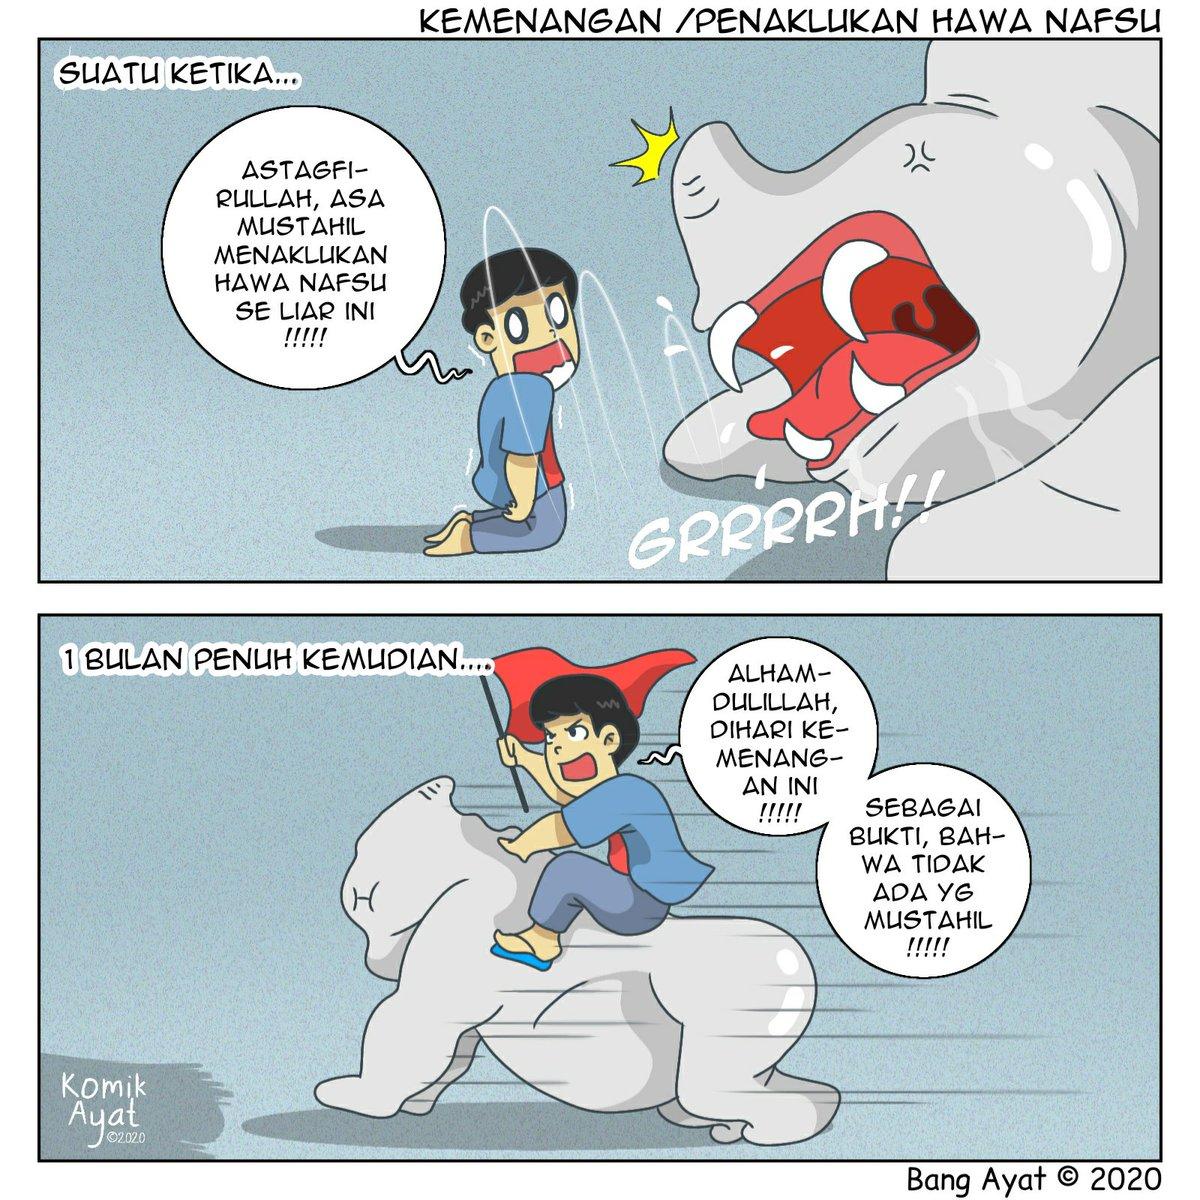 H+30 #sahurramadhan Tetapi perjuangan masih berlanjut guys!  Mohon maaf lahir dan batin  #komikayat #urangbanjar #komikstrip #iqomic #komikinajah #komiklokal #kisahvisualkeseharianpic.twitter.com/xCB6GusBxp